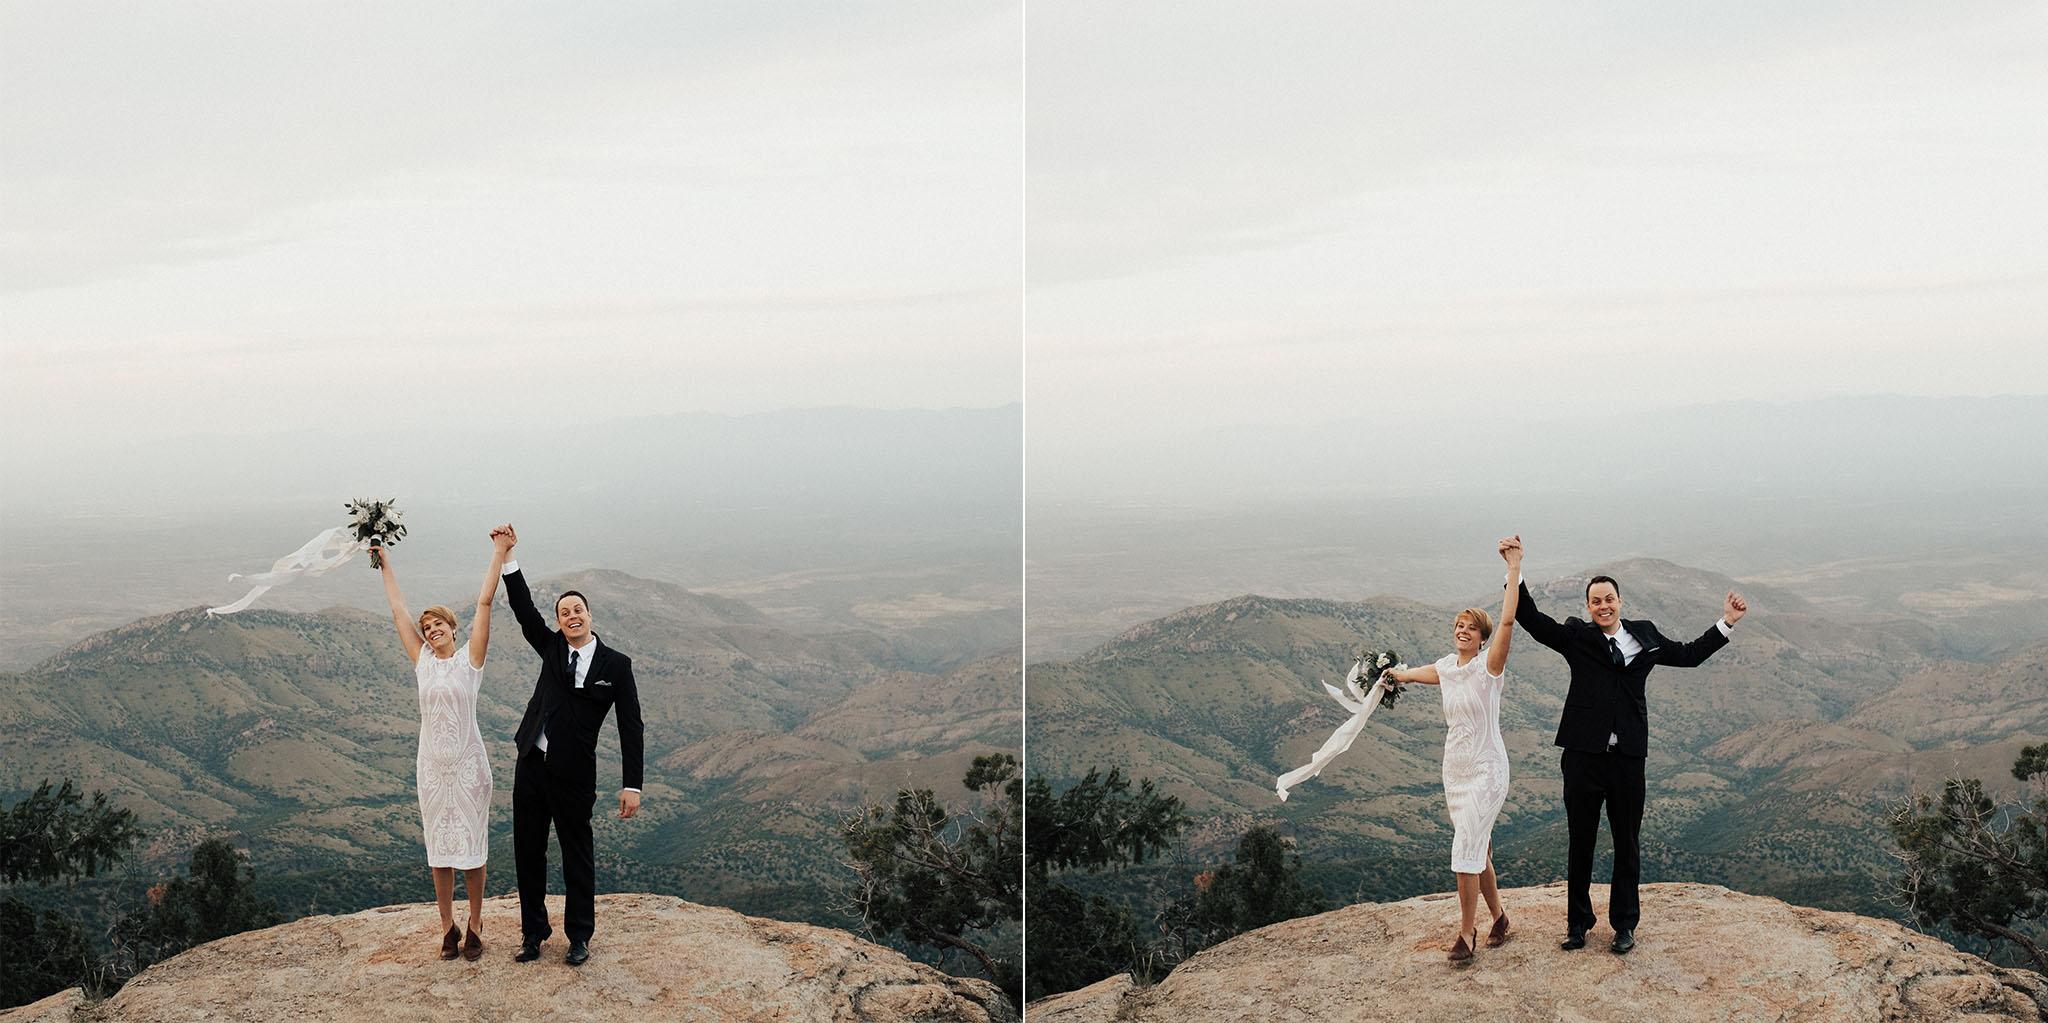 Arizona-Intimate-Elopement-Adventure-Photographer-Mount-Lemmon (34).jpg